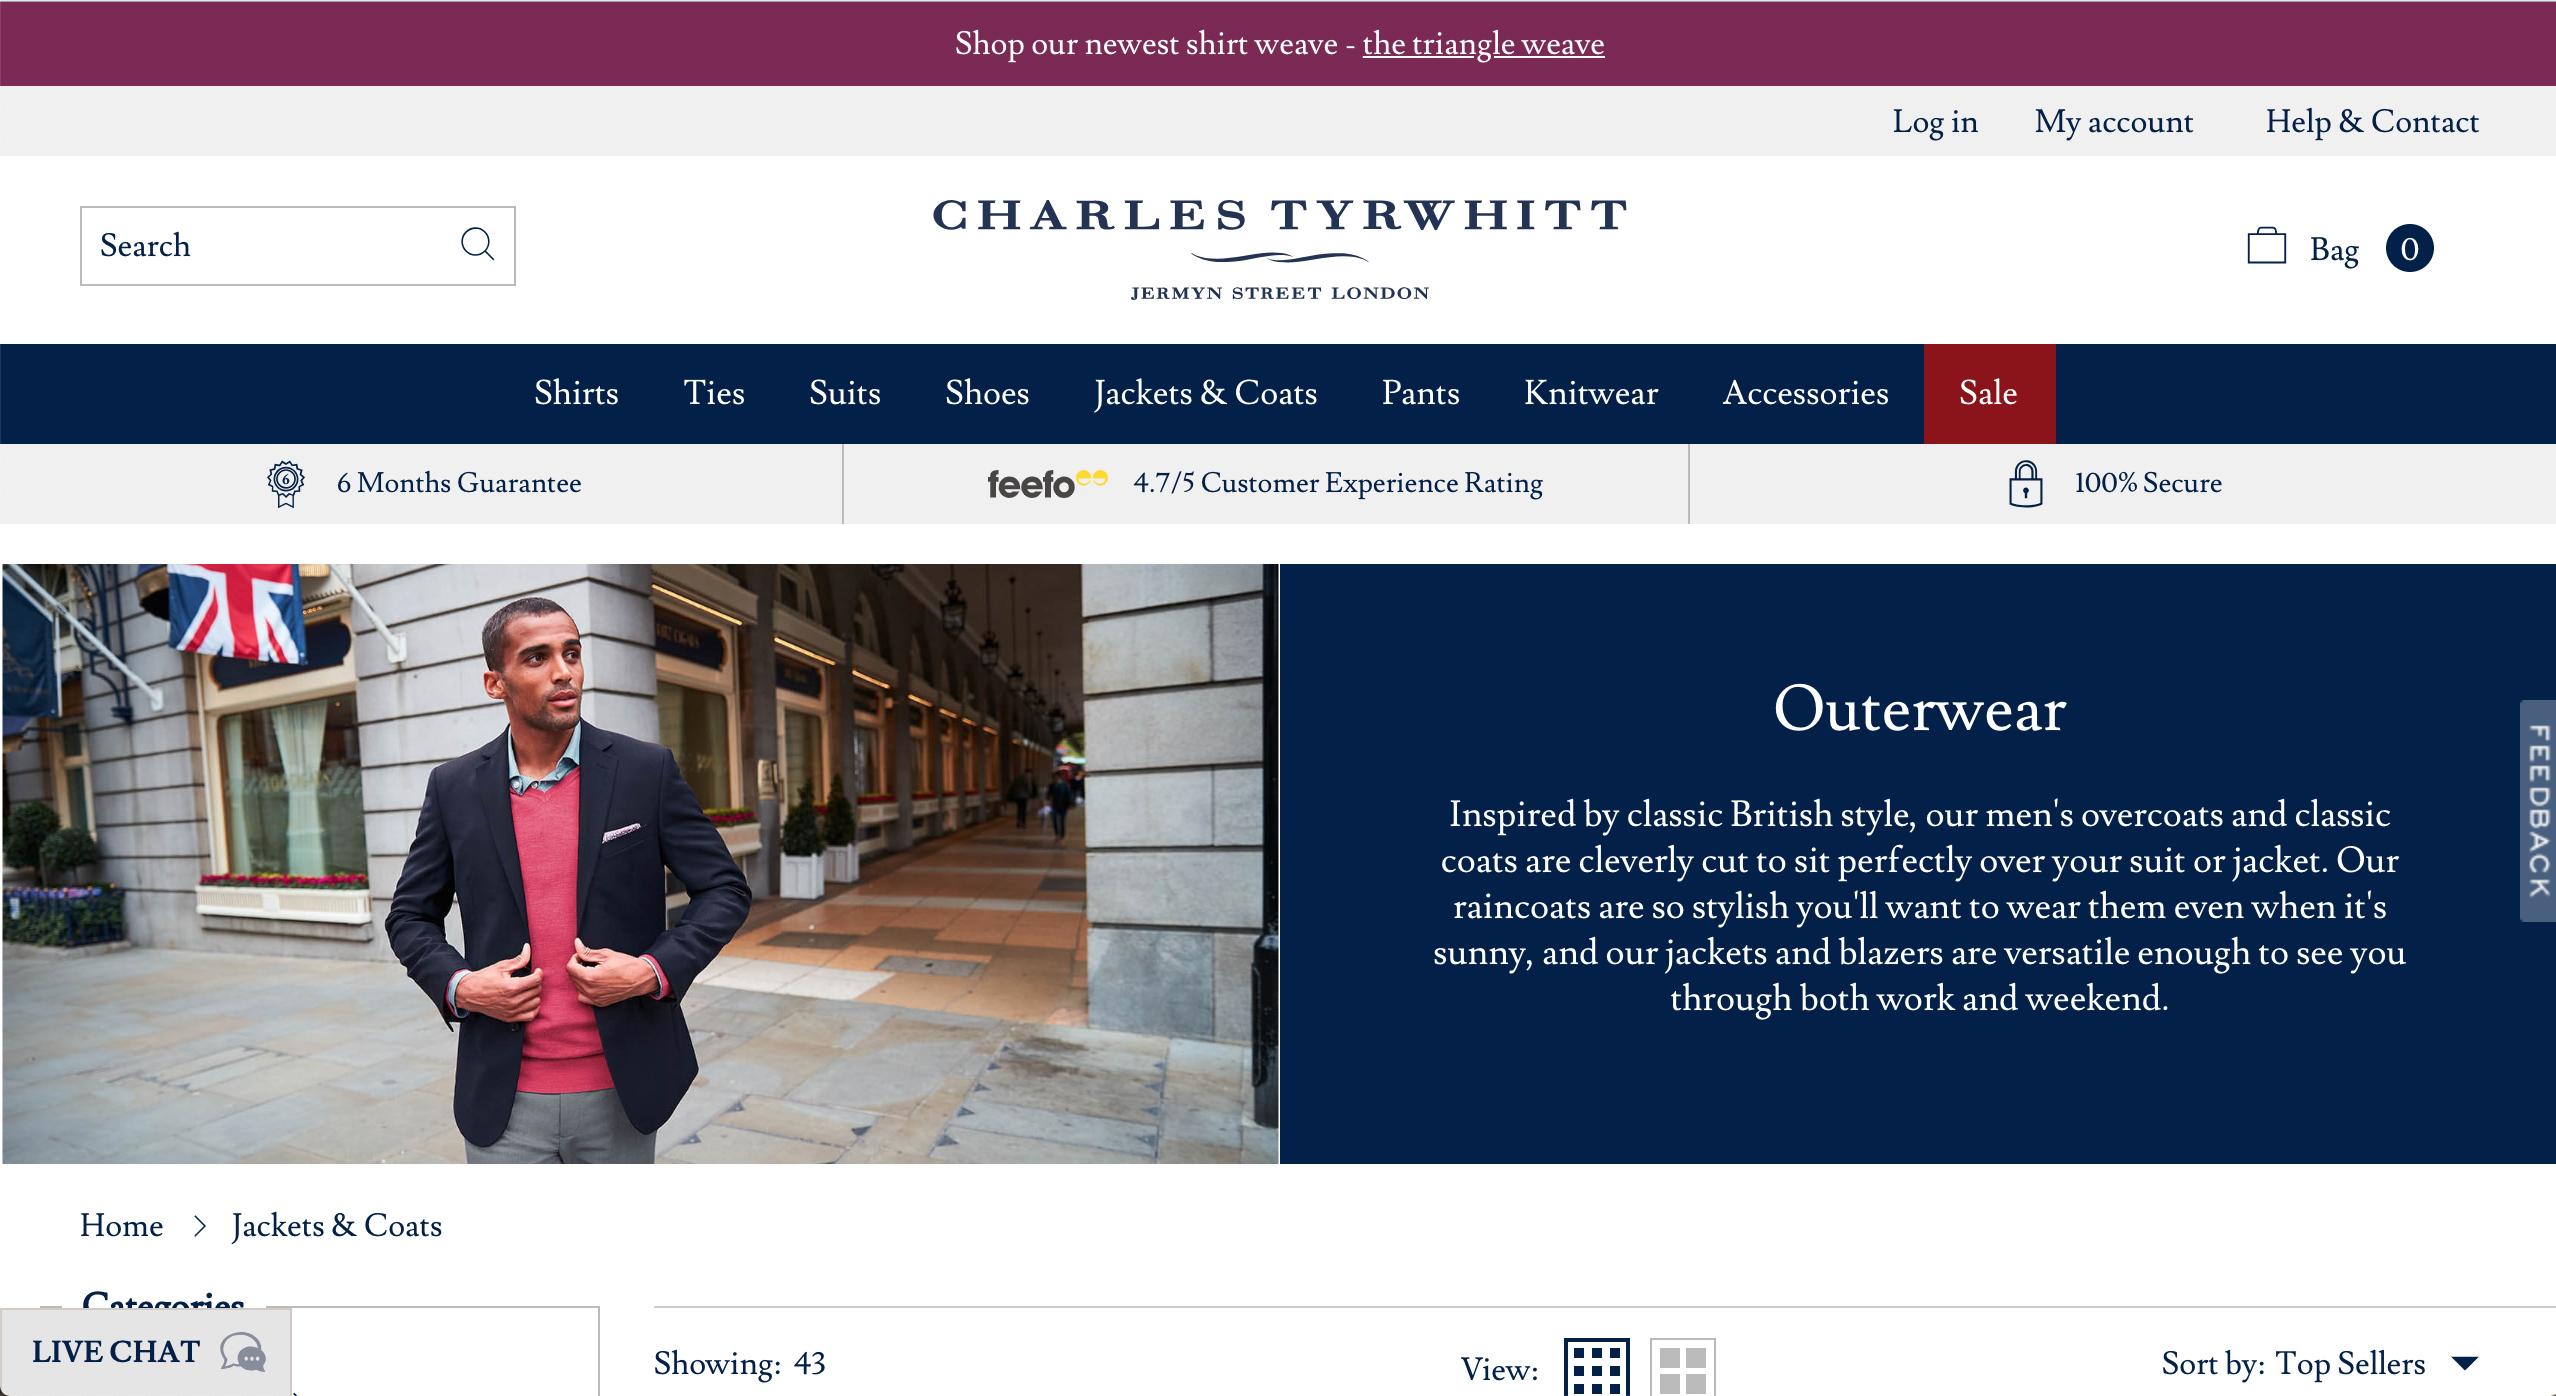 Charles Tyrwhitt Jackets & Coats page